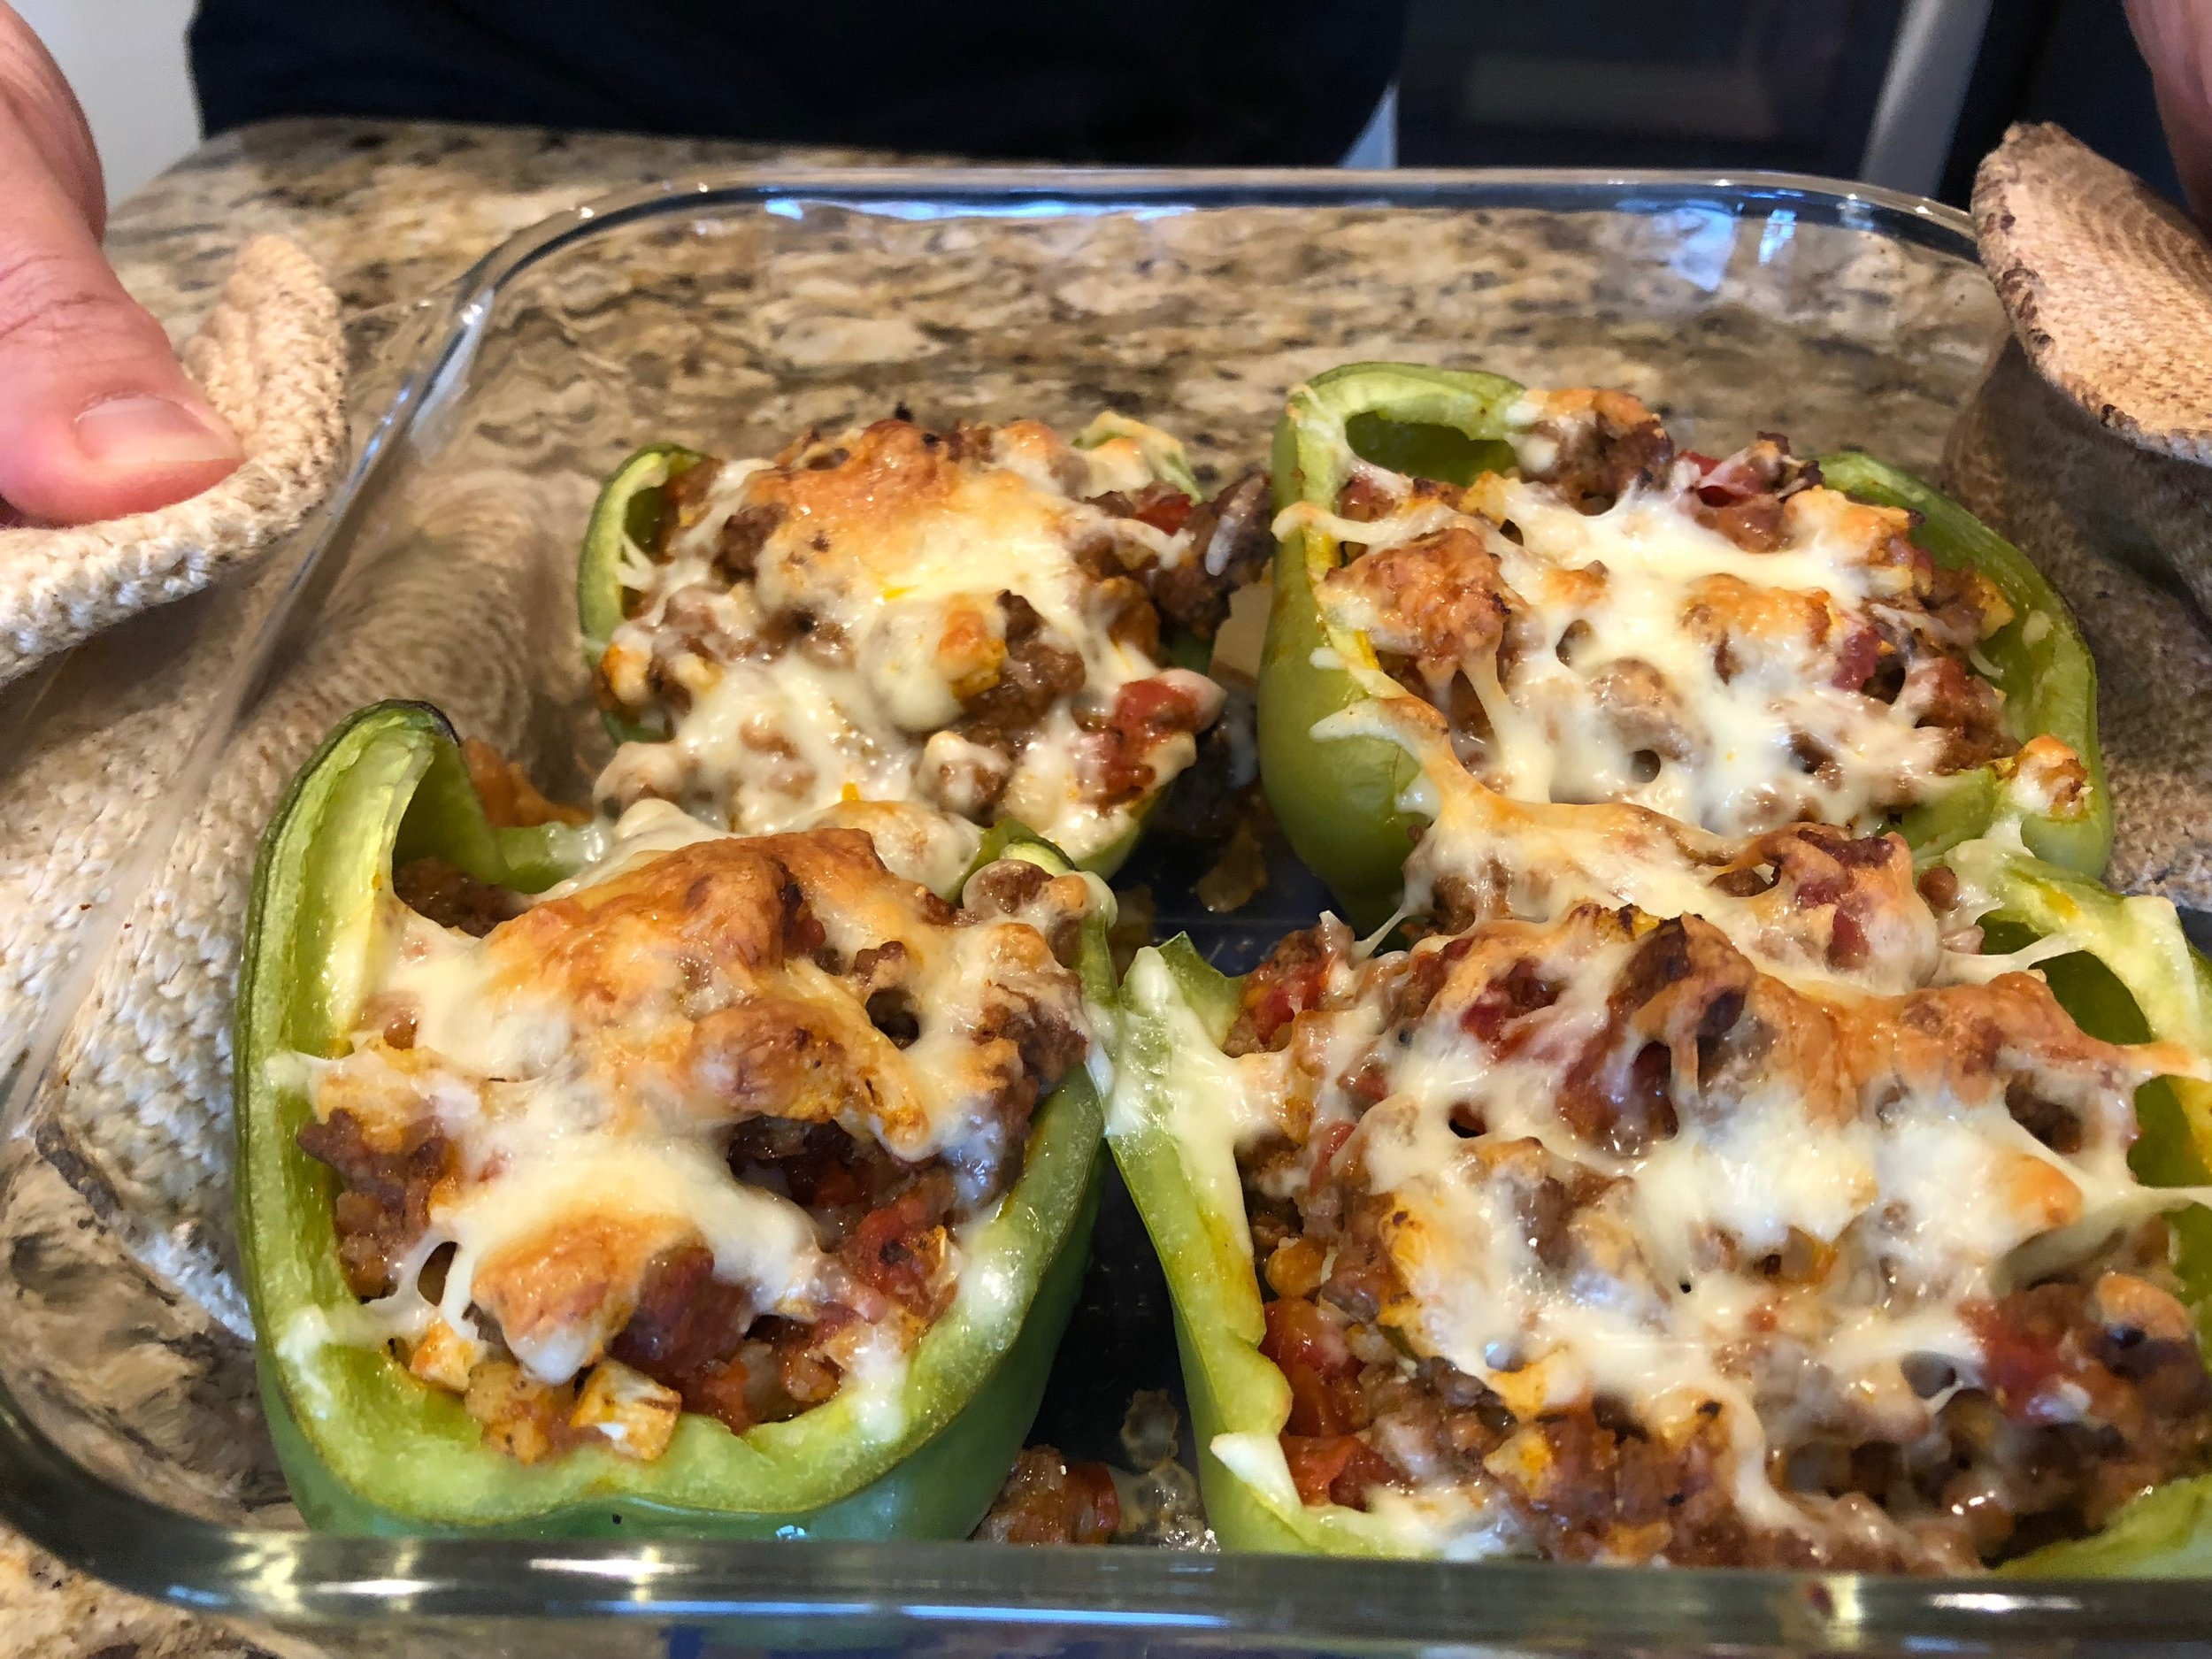 keto diet stuffed bell peppers